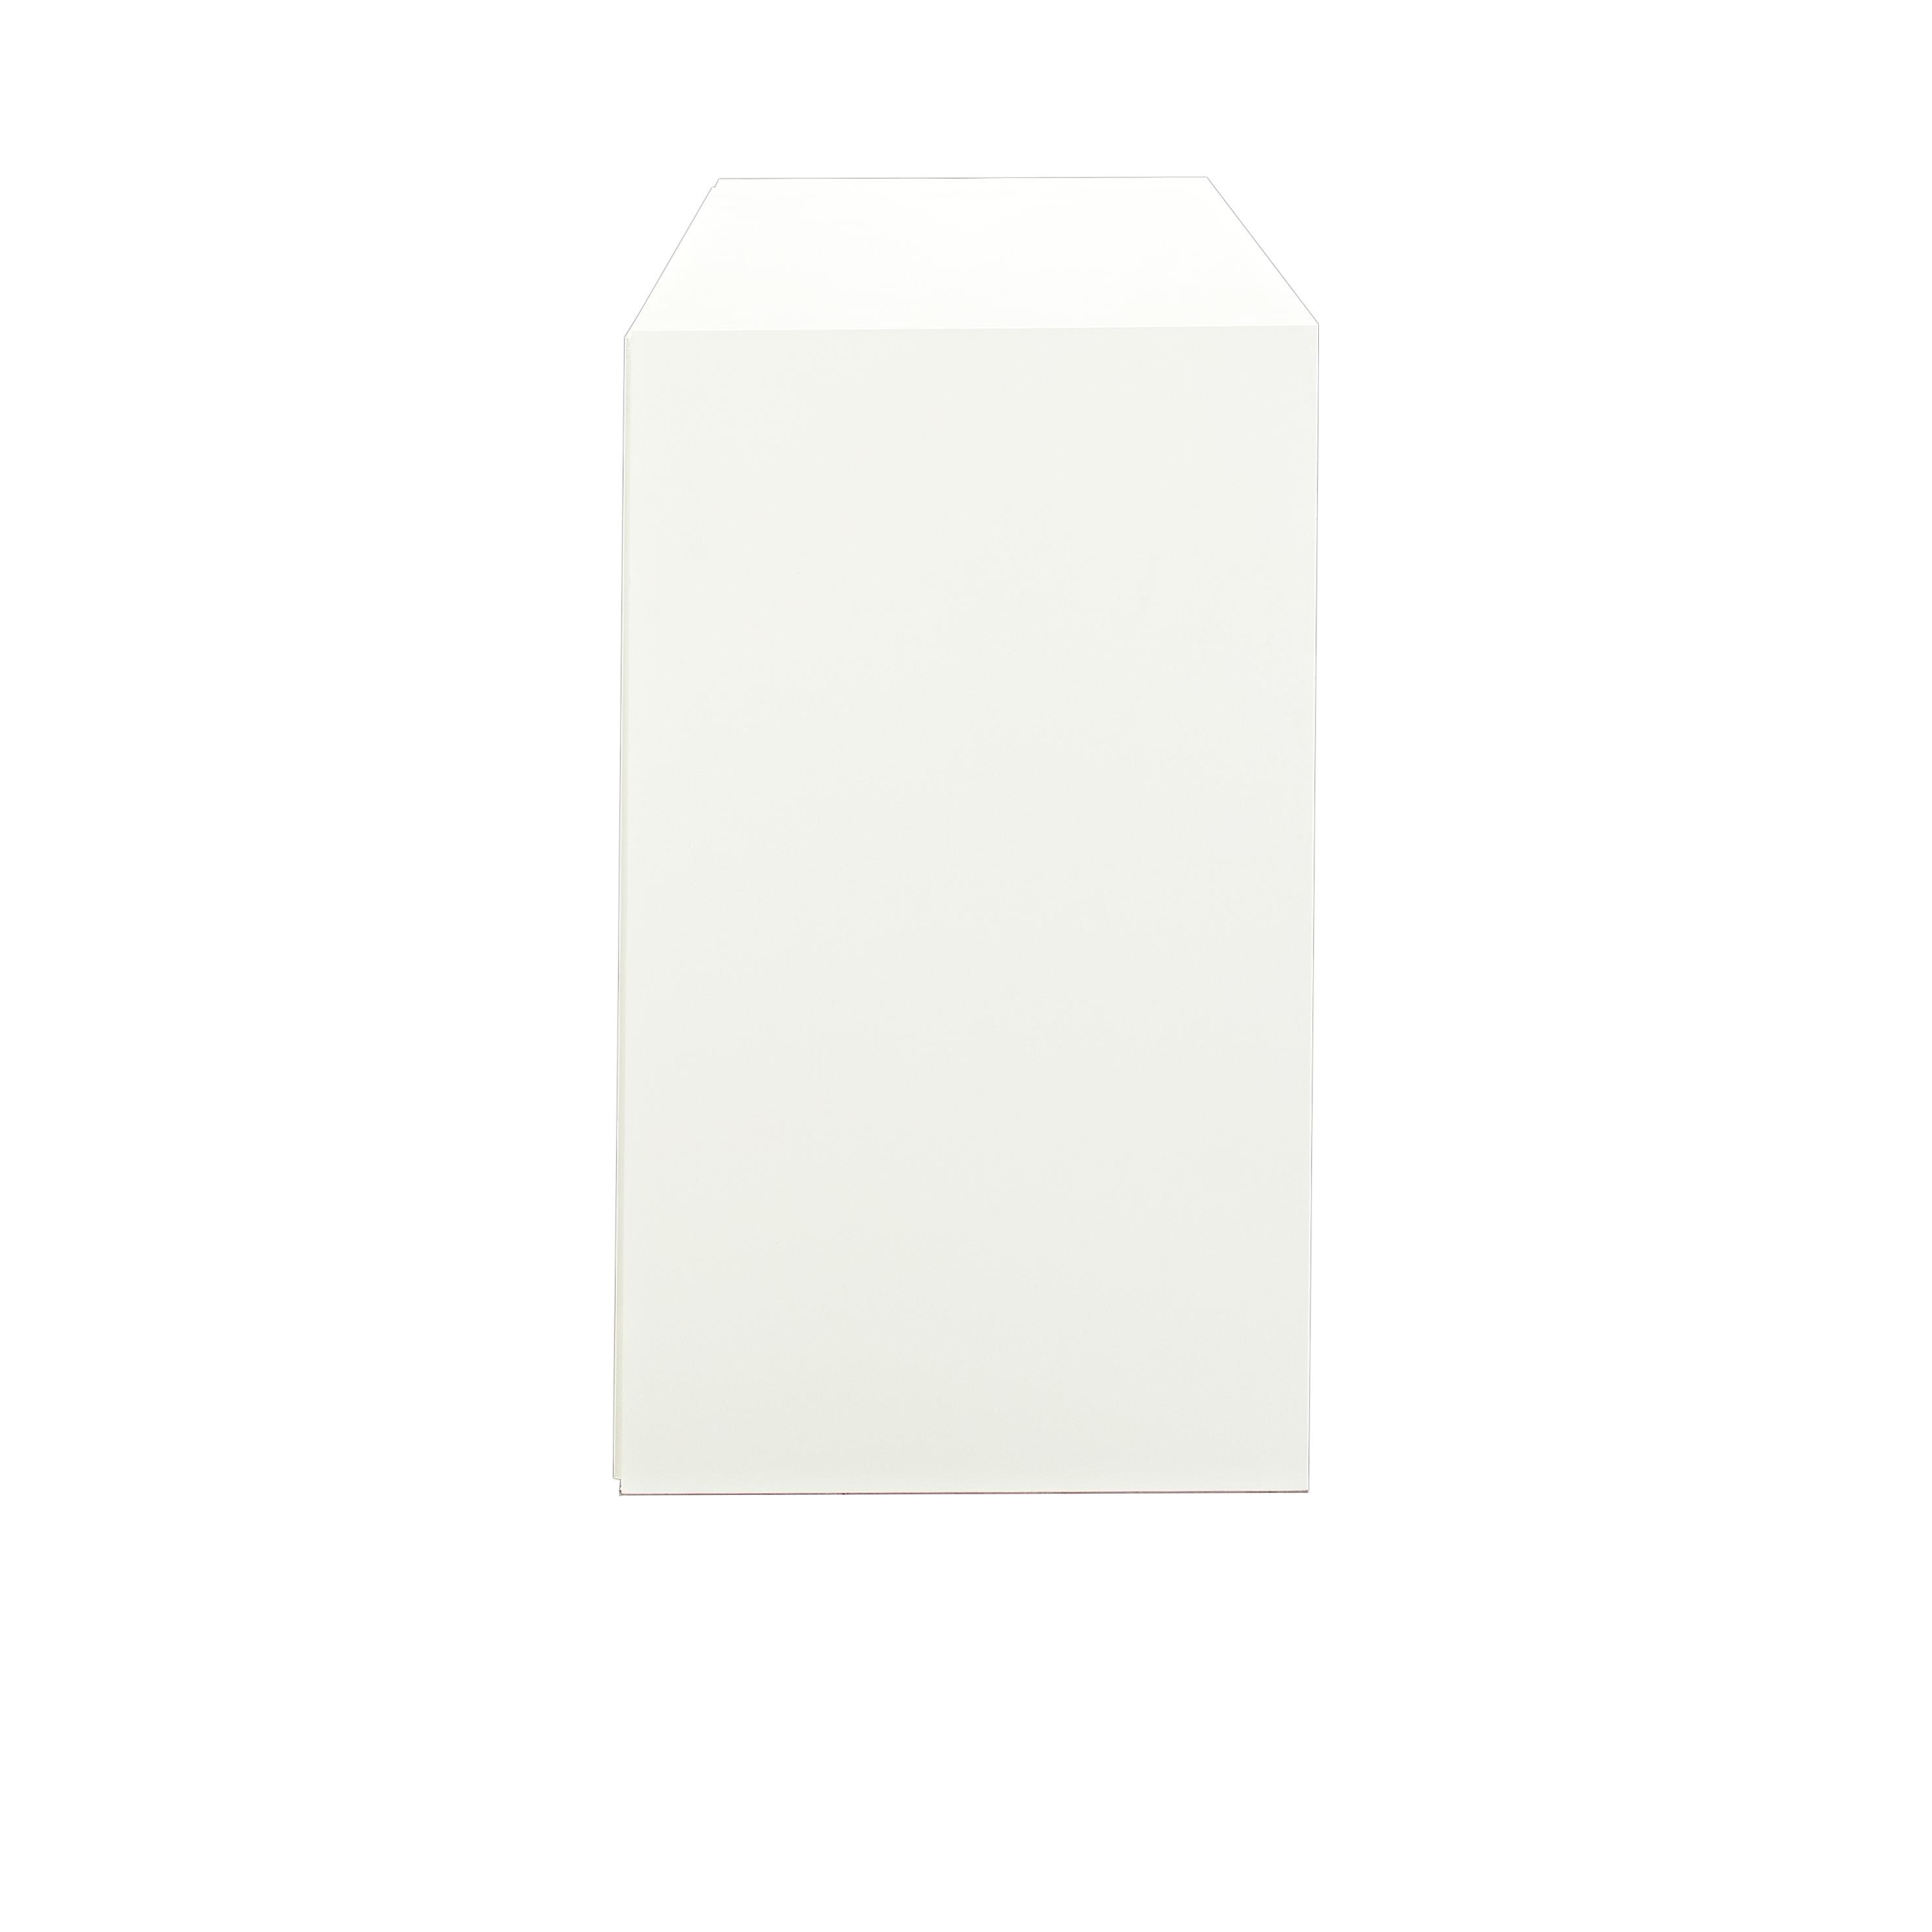 Line Byrå 3+3 lådor White från sidan - englesson.se